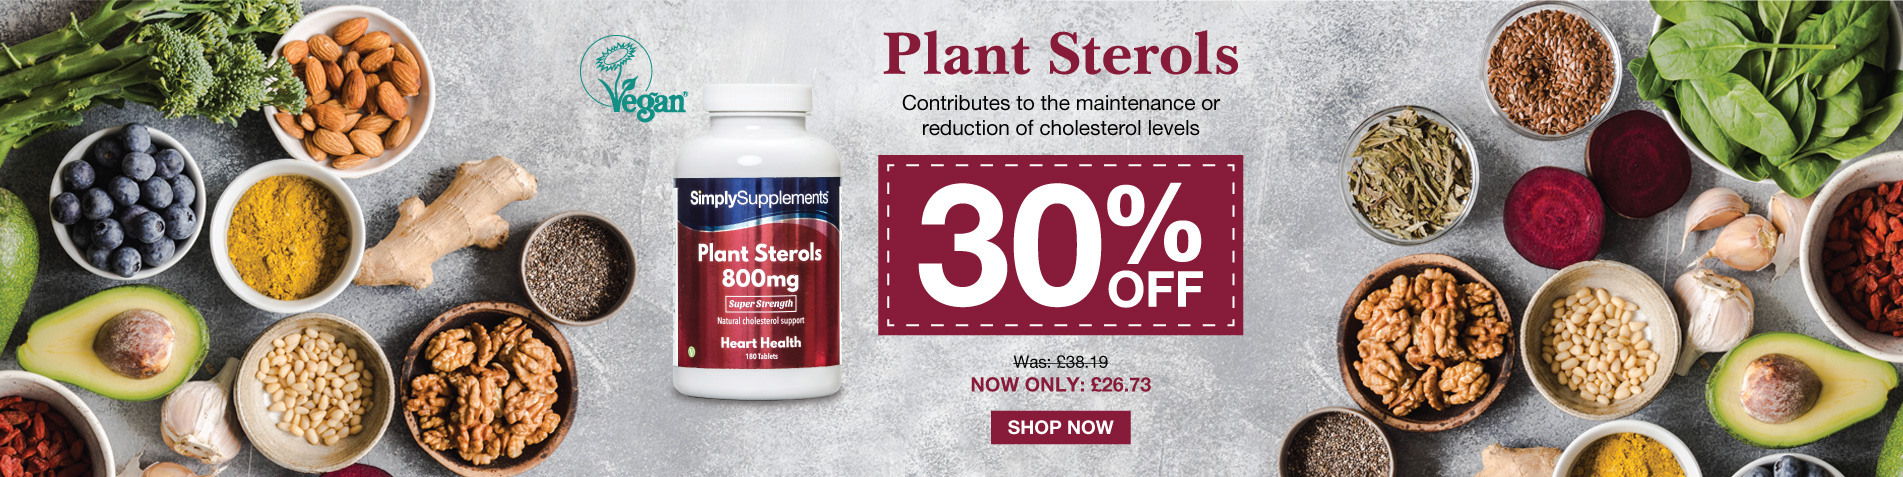 30% off Plant Sterols